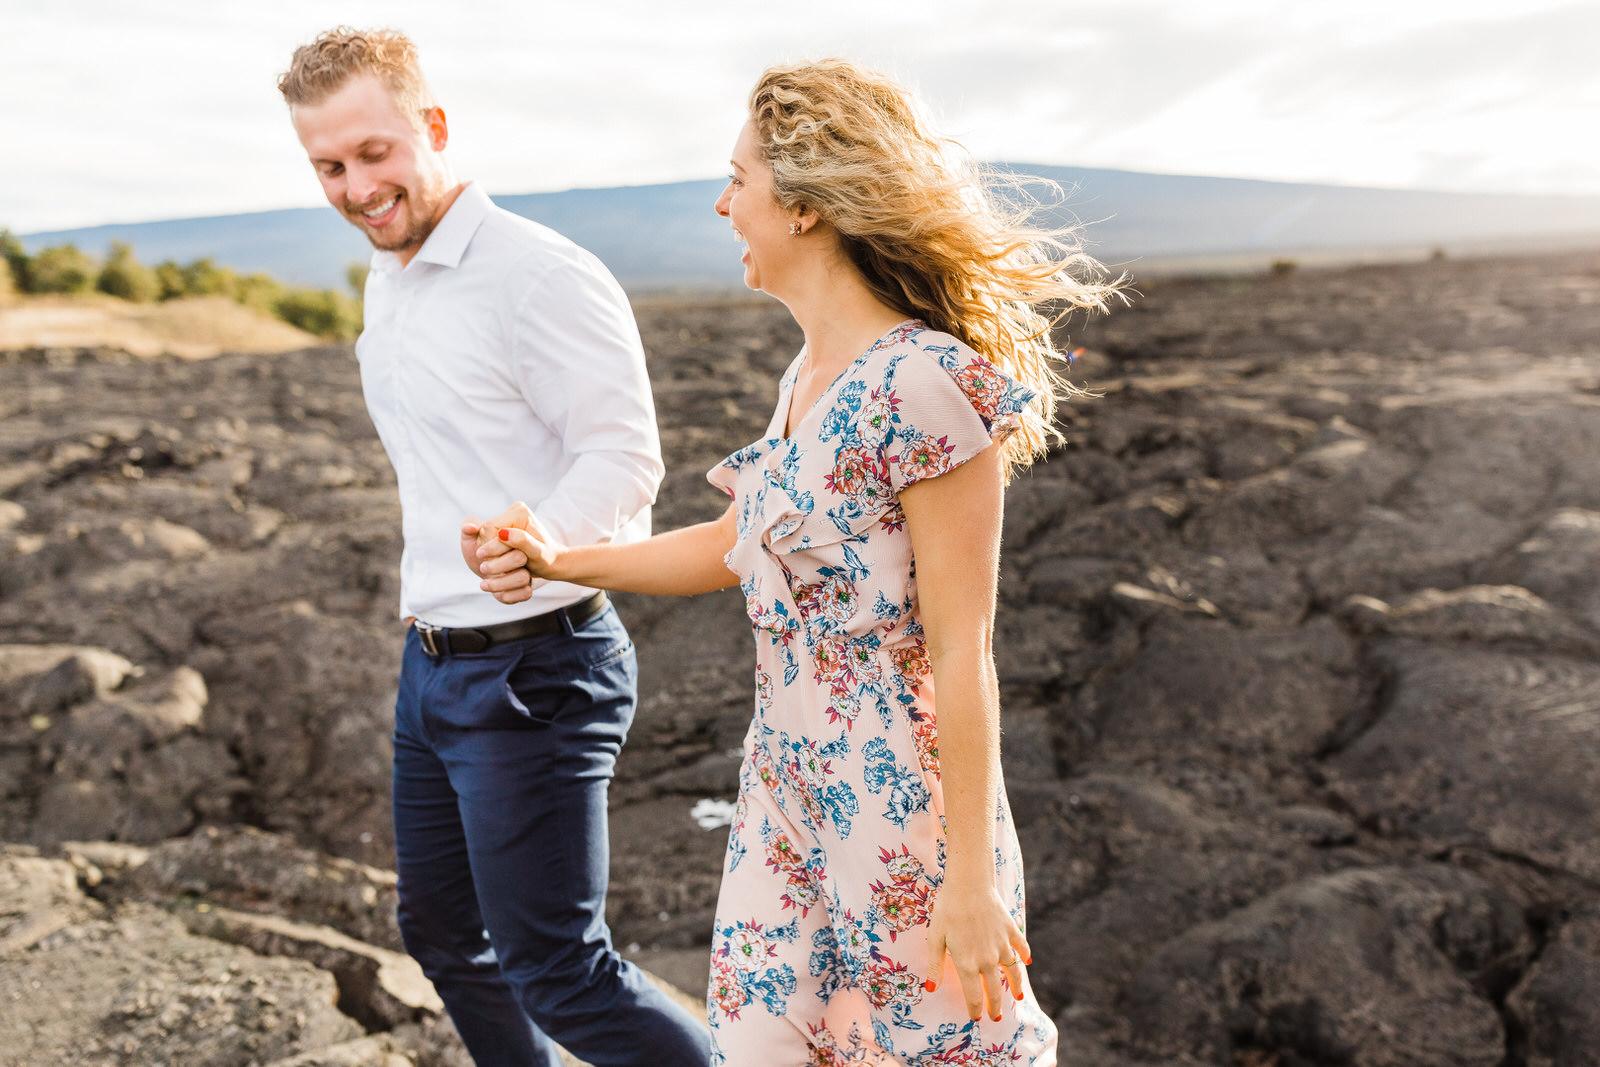 engagements-hilo-happy-couple-big-island-hawaii-2.jpg